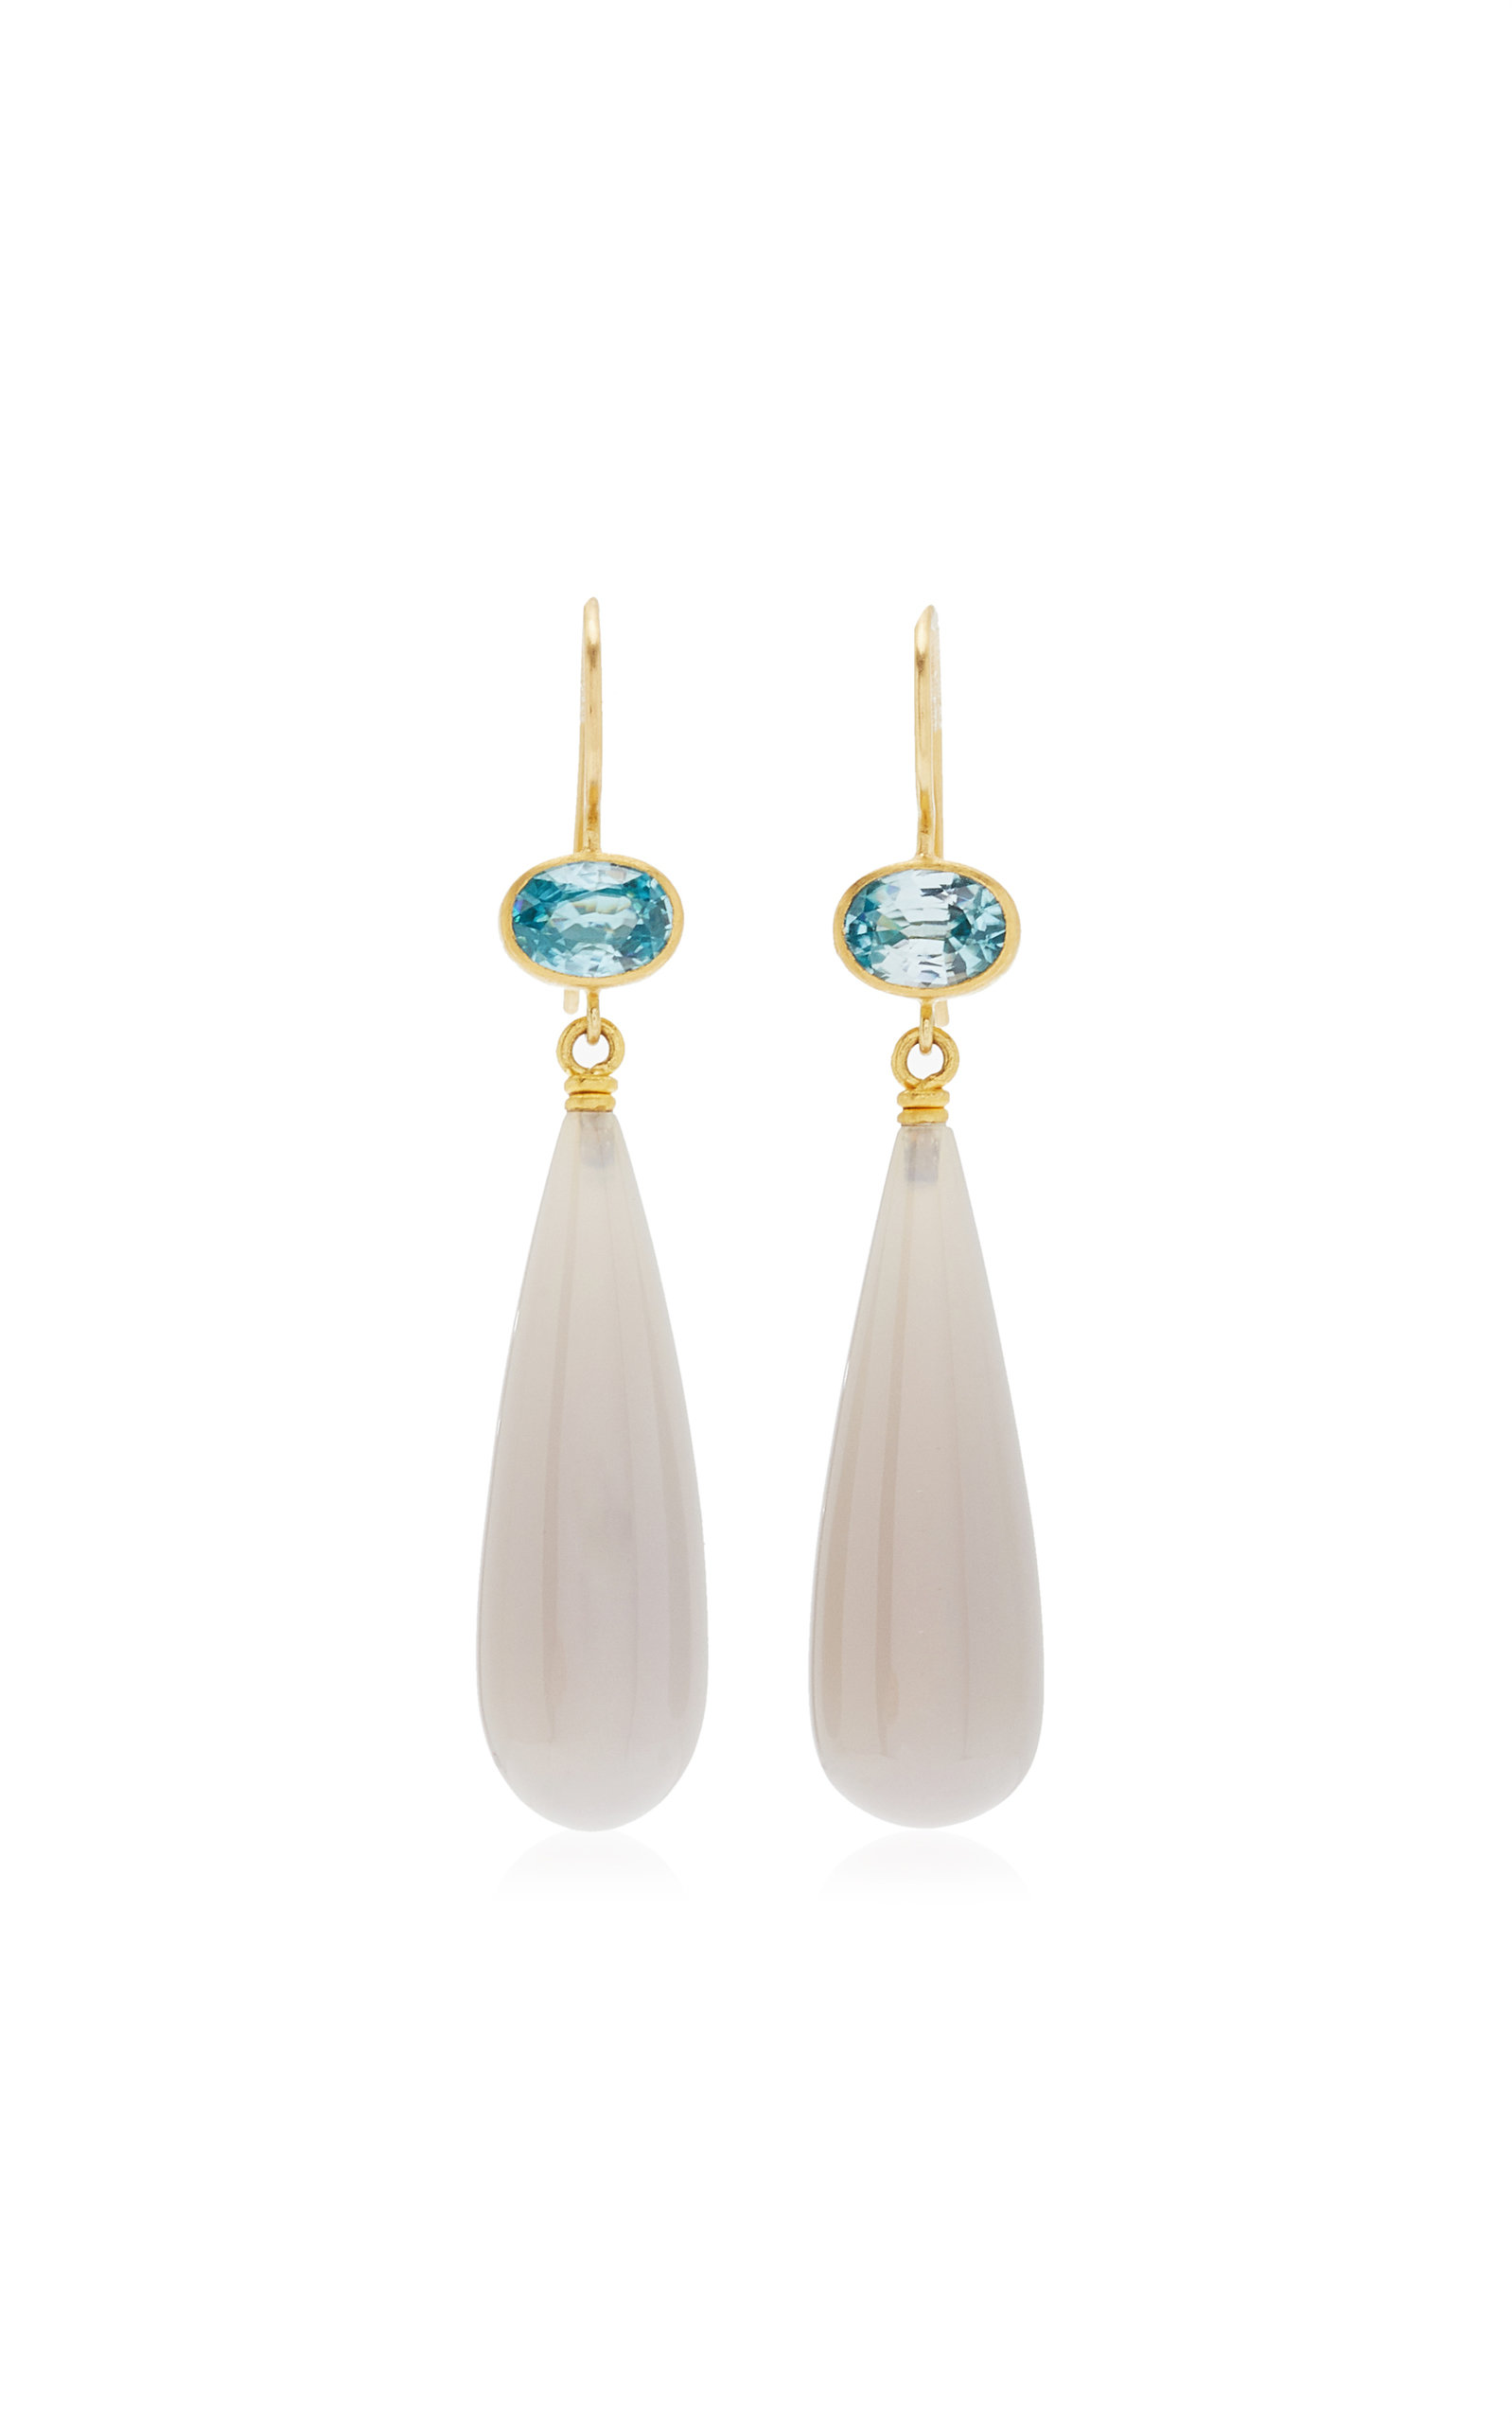 Mallary Marks - Women's Apple and Eve 22K Yellow Gold Zircon; Agate Earrings - Multi - Moda Operandi